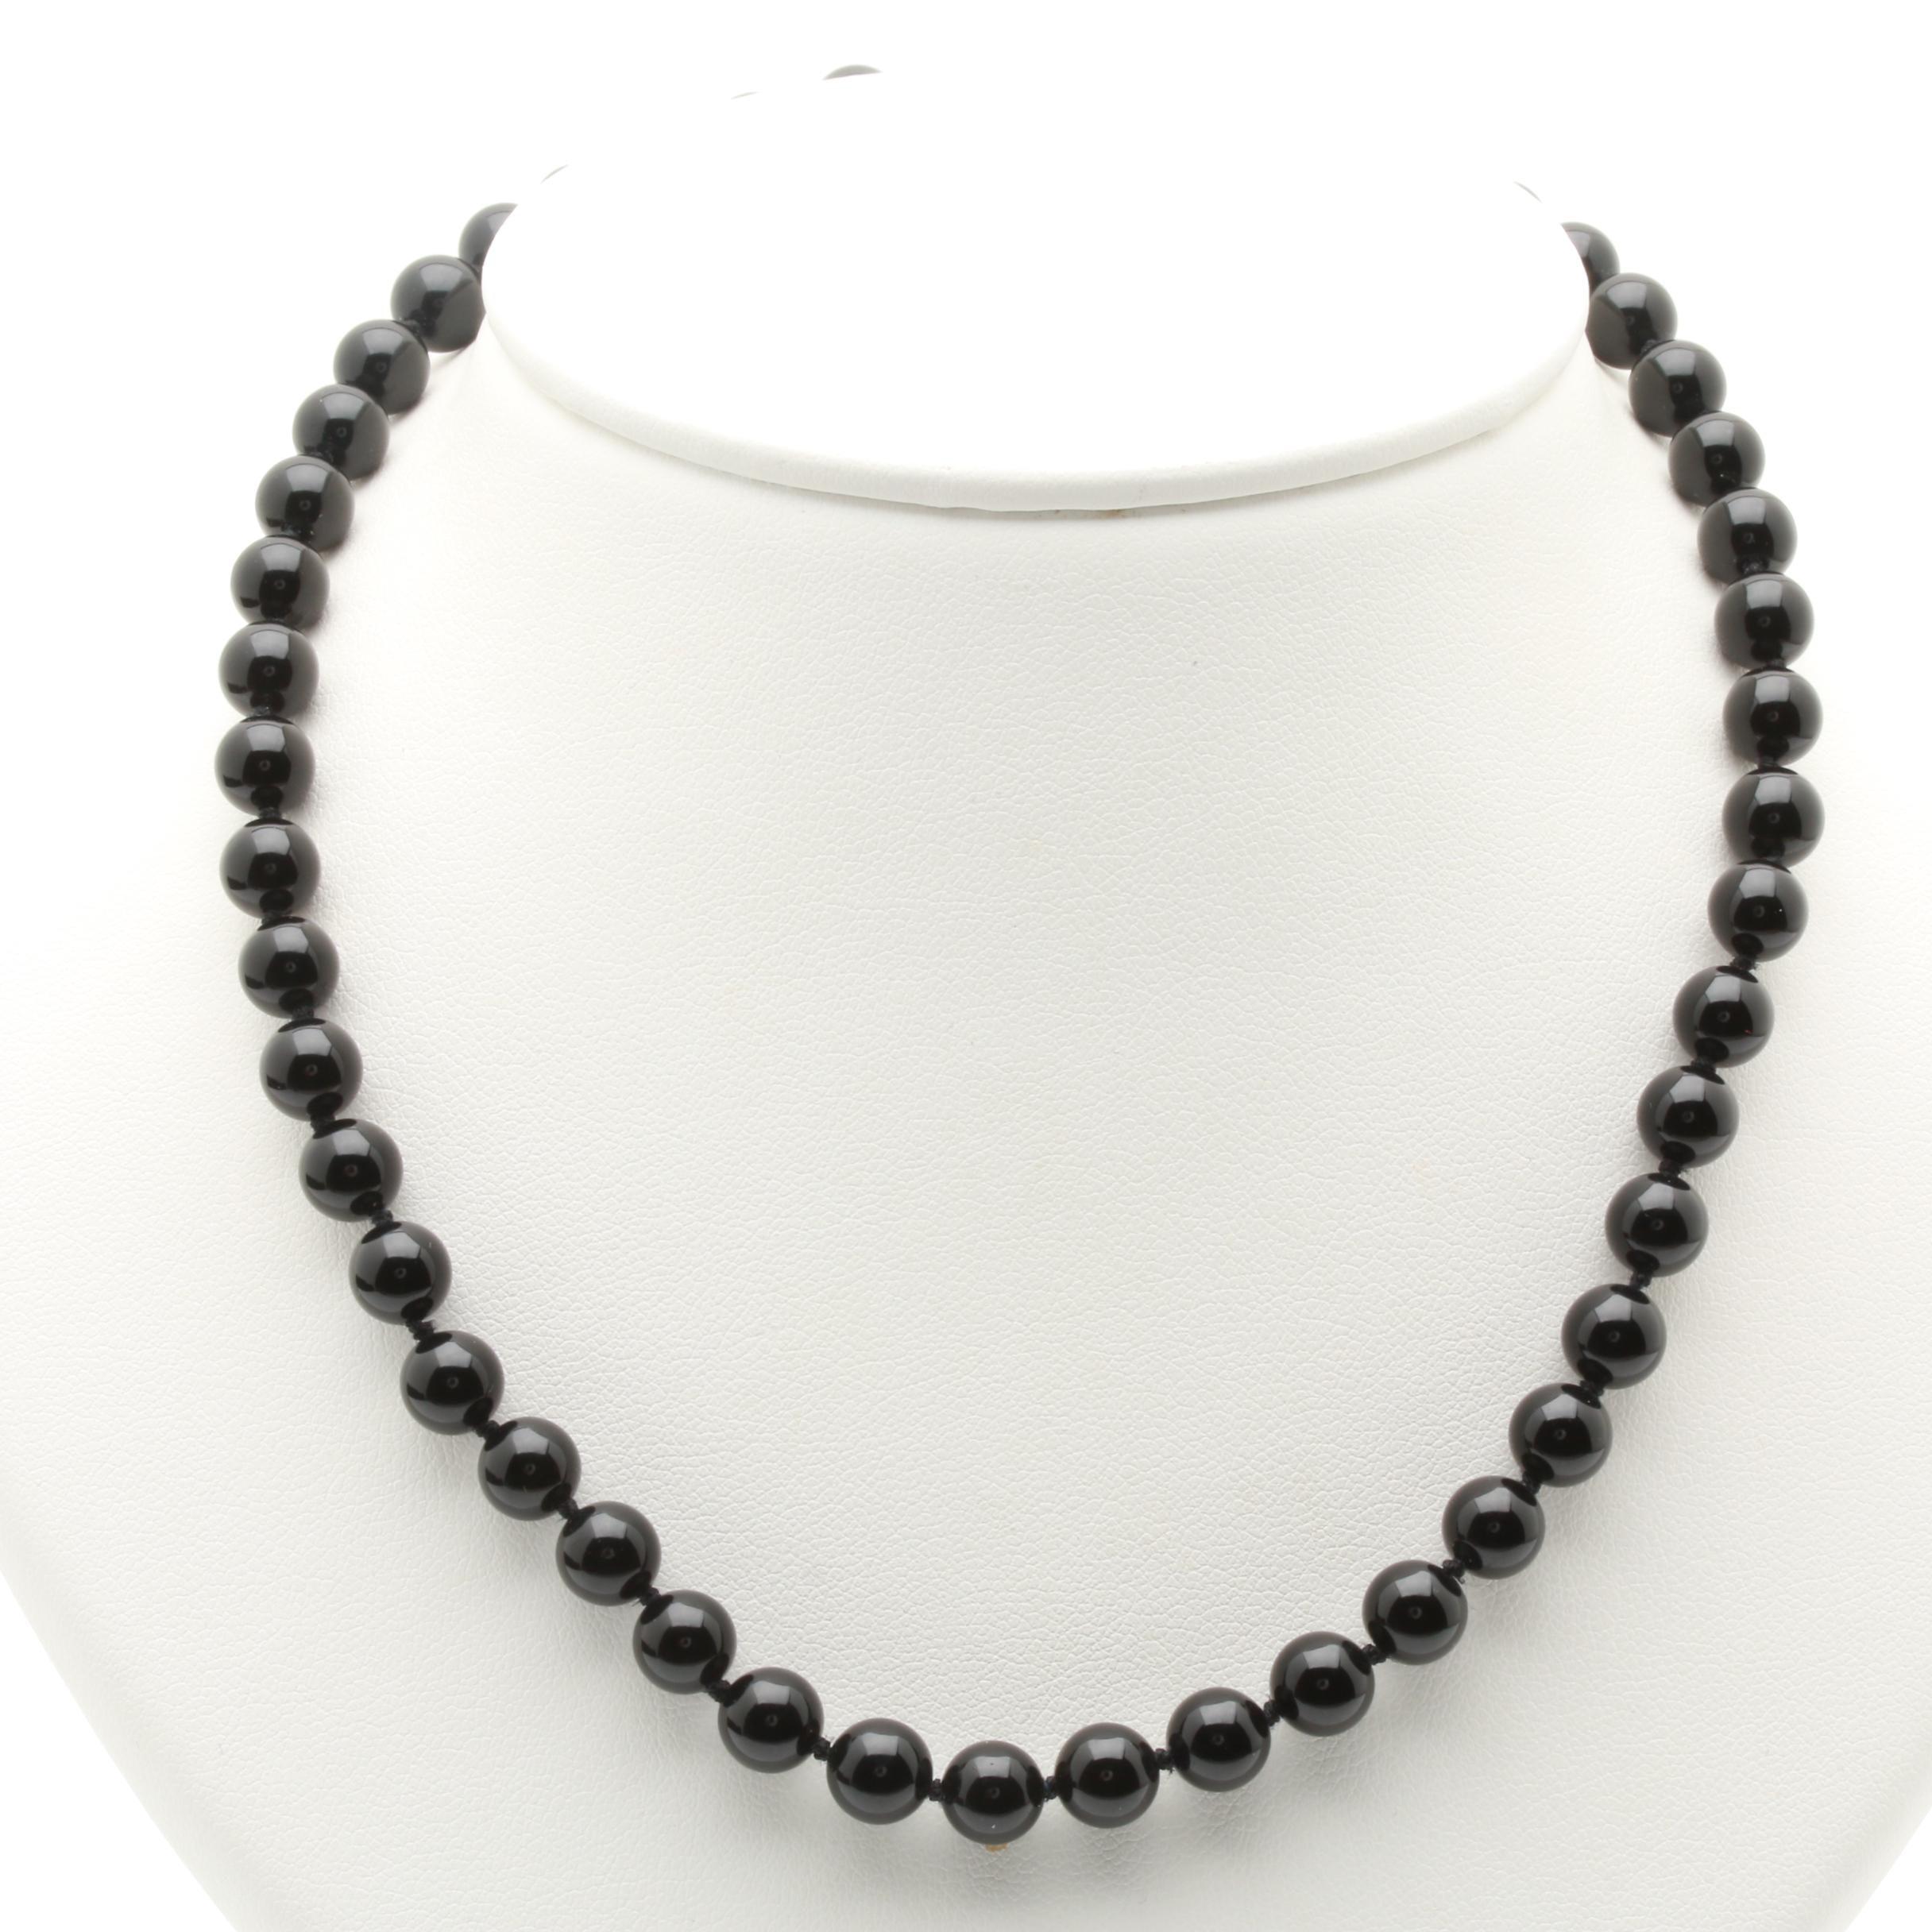 14K Yellow Gold Black Onyx Beaded Necklace